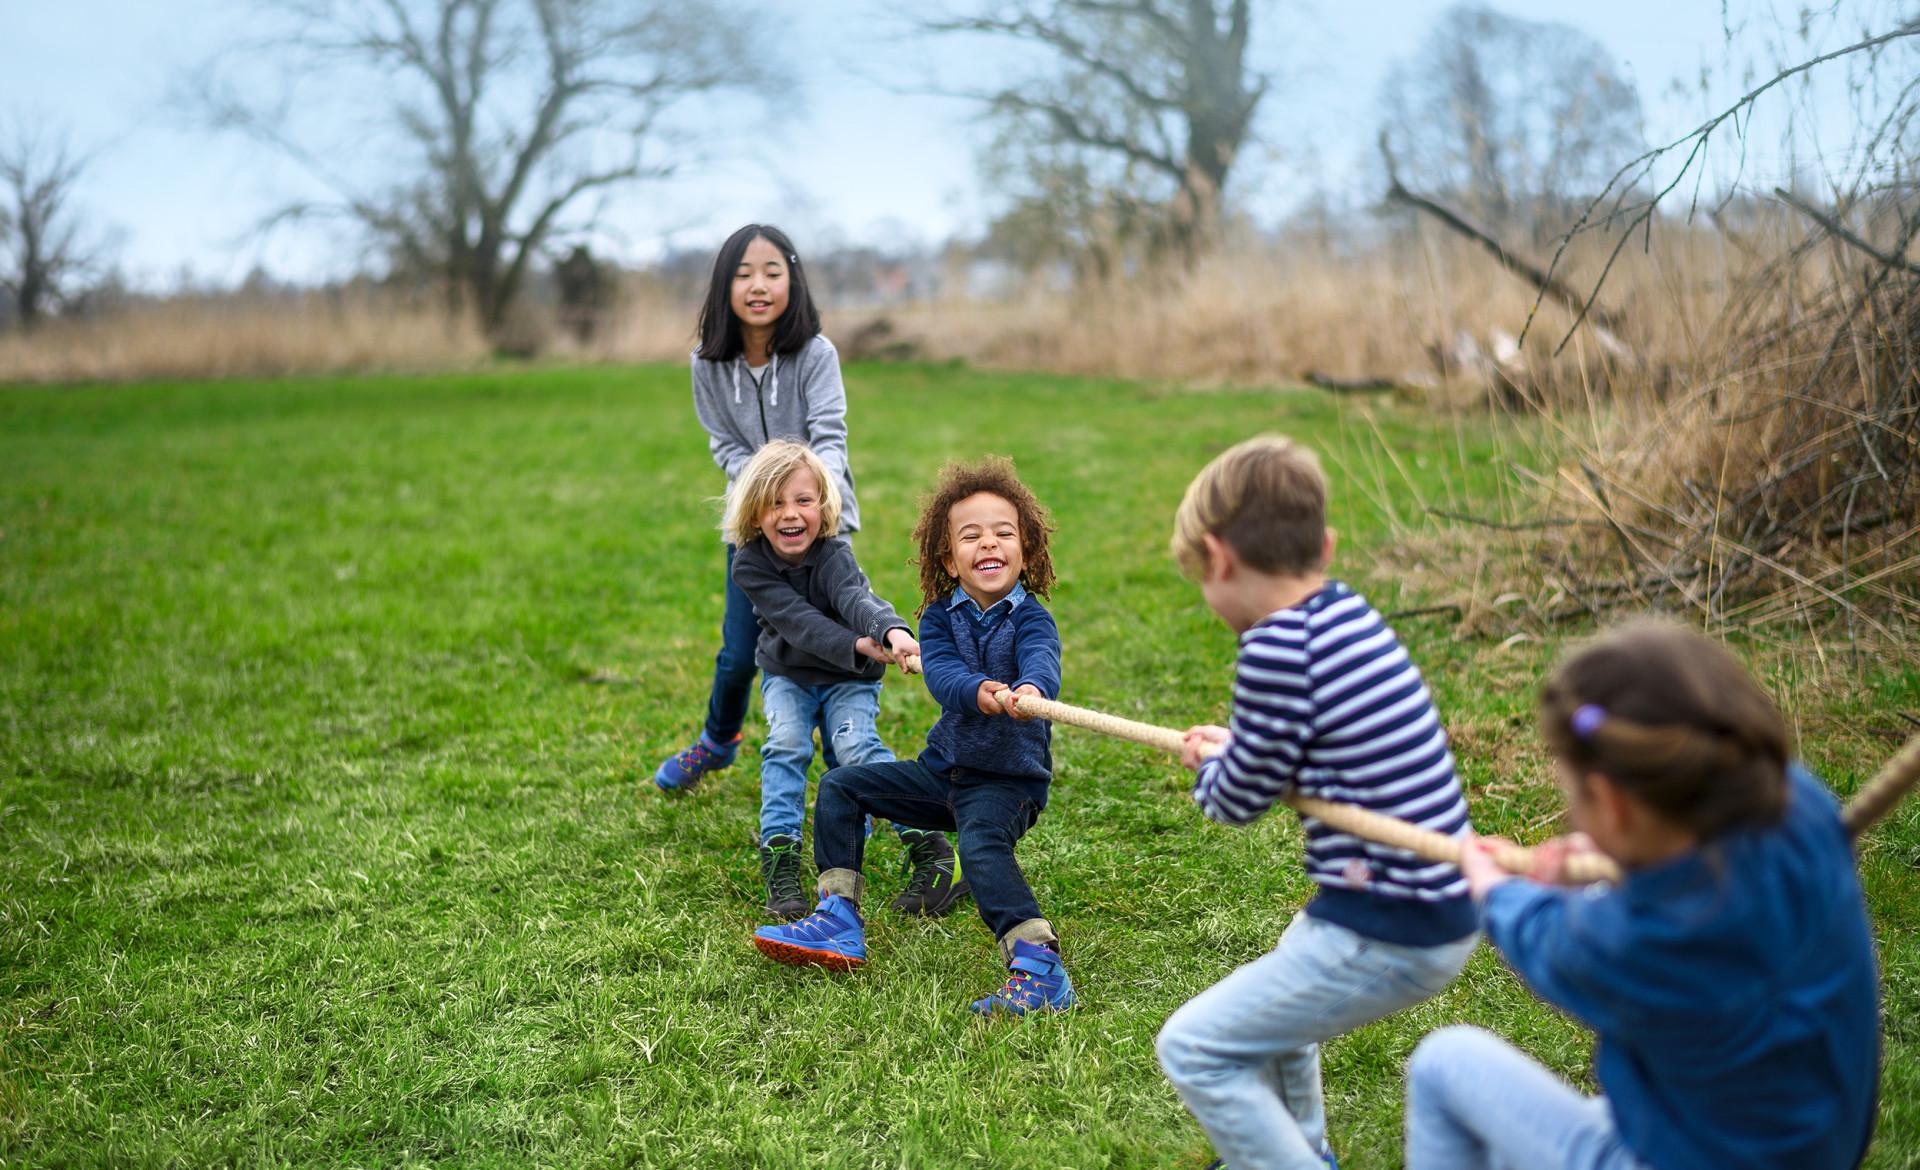 Image photo with the LEDRO GTX MID JUNIOR, LOWA Kids Kampagne 2019